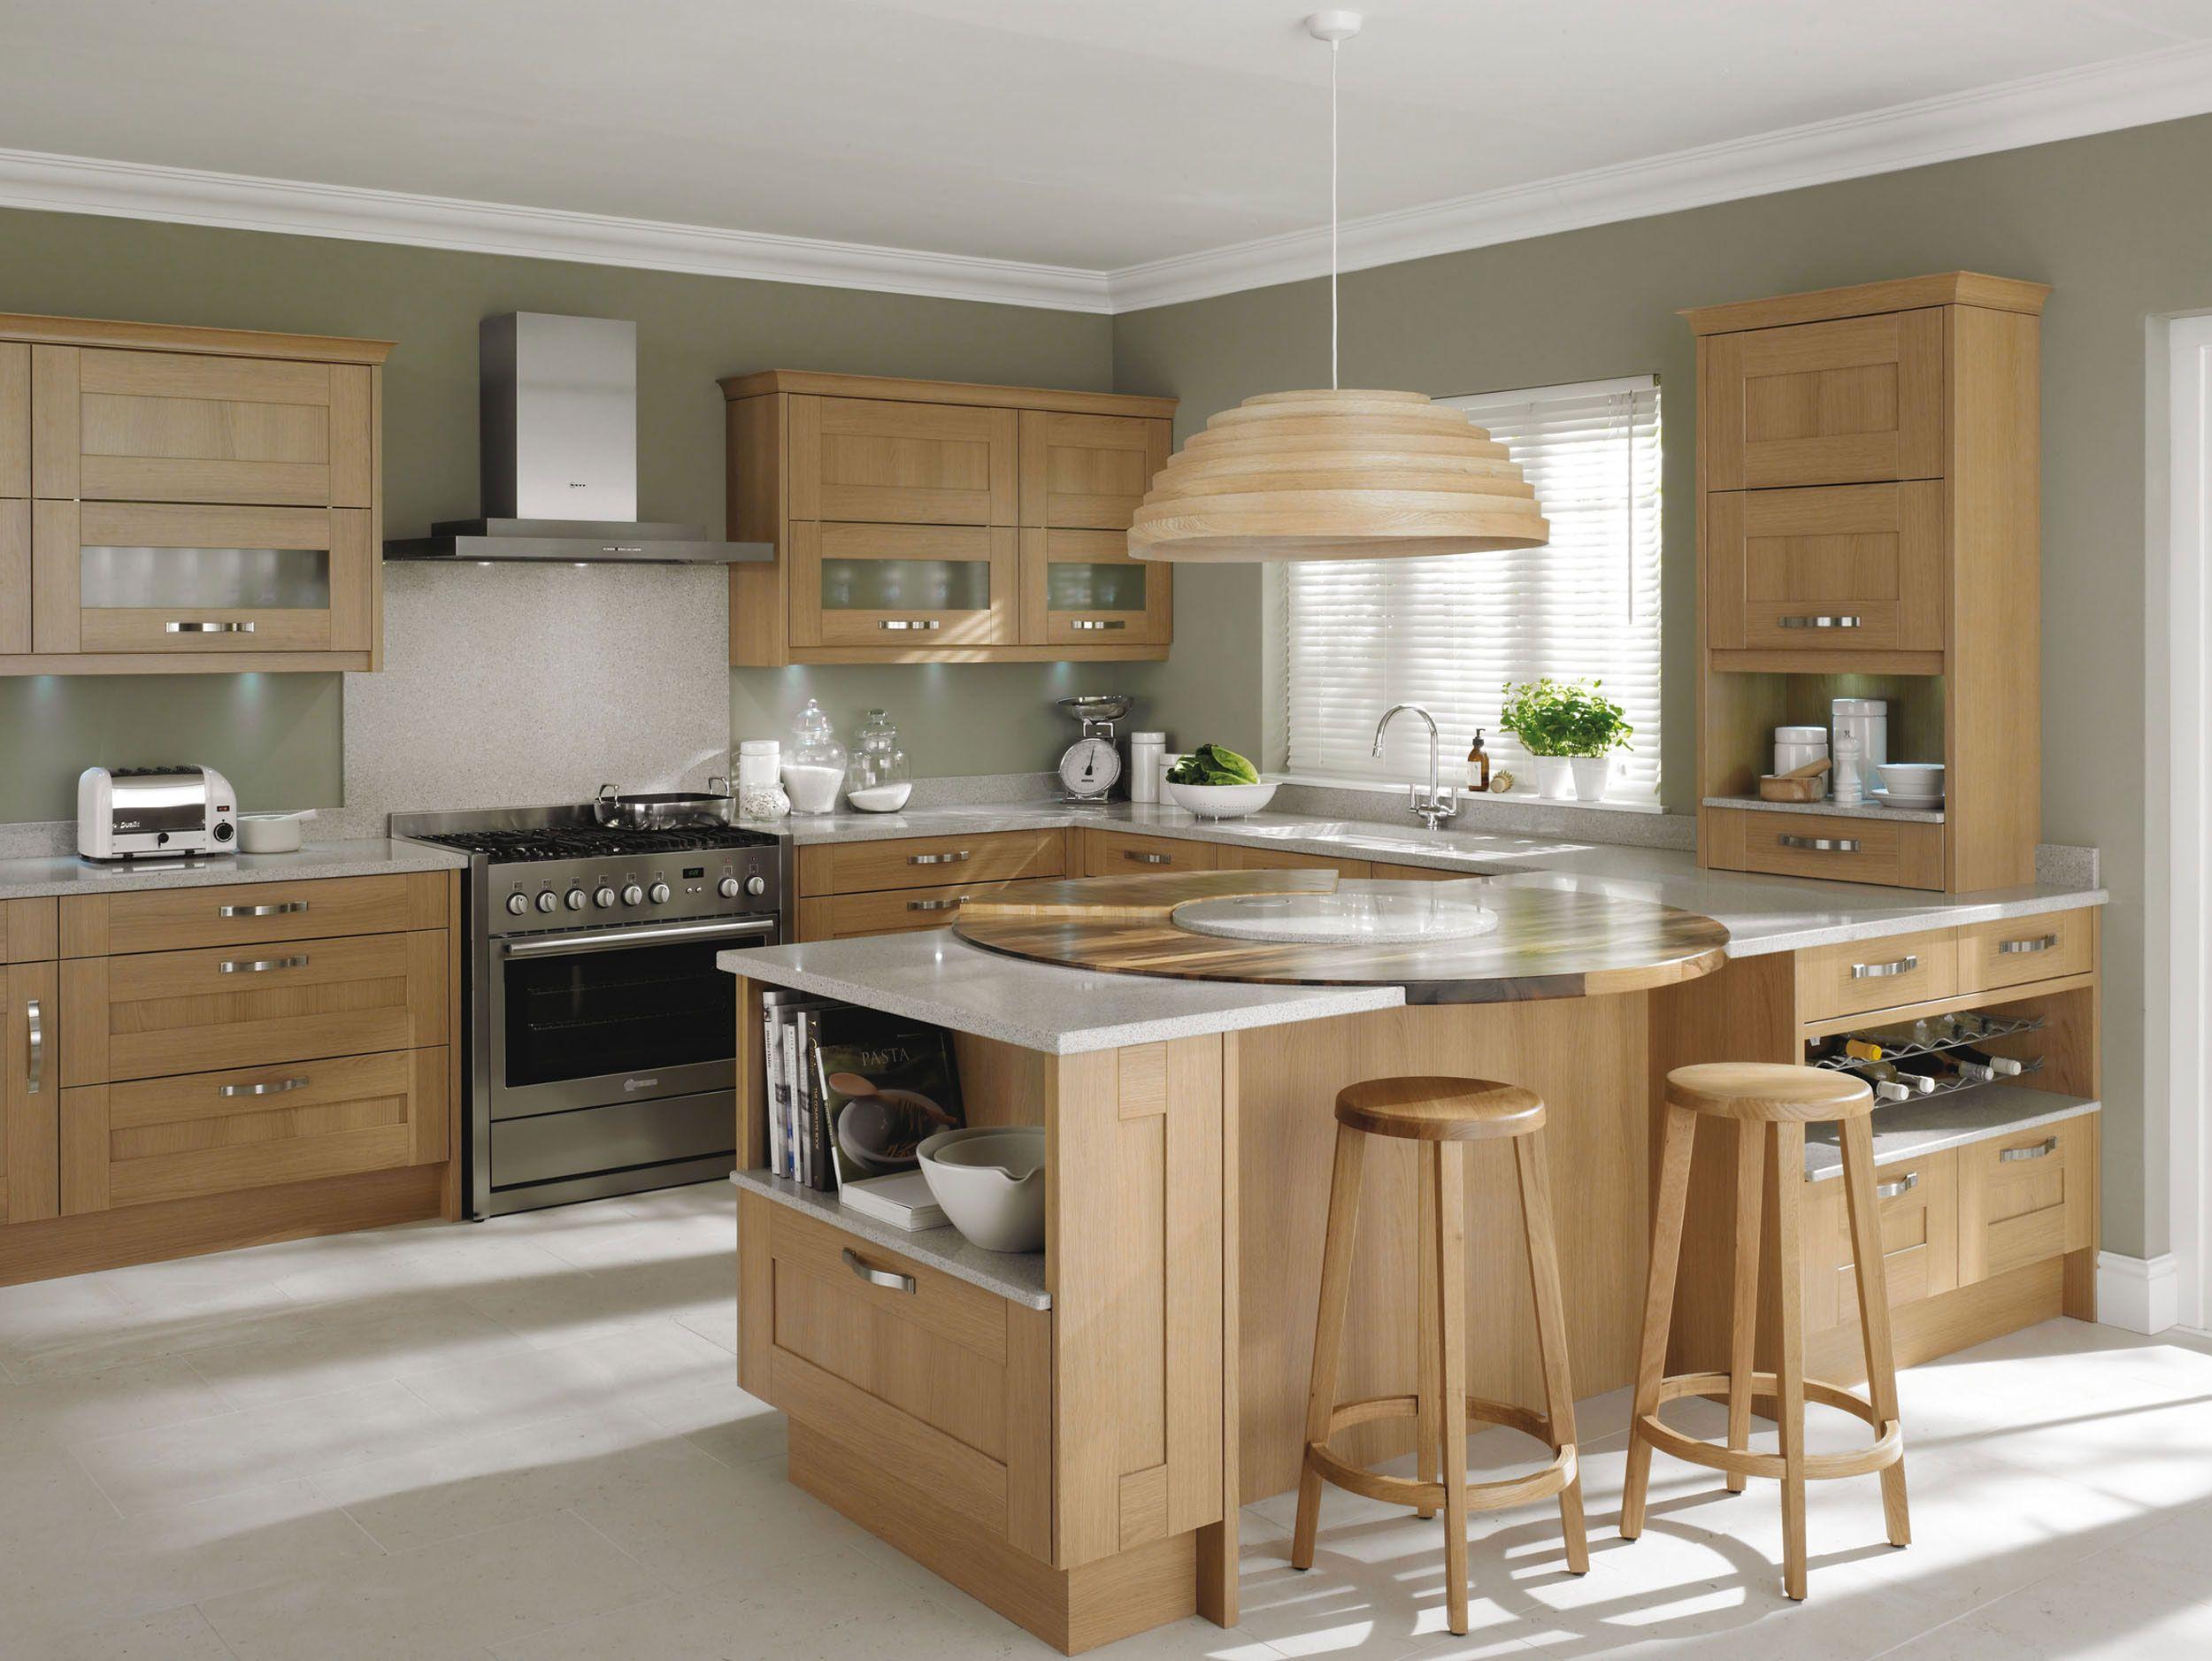 oak kitchen ideas Google Search Kitchen island